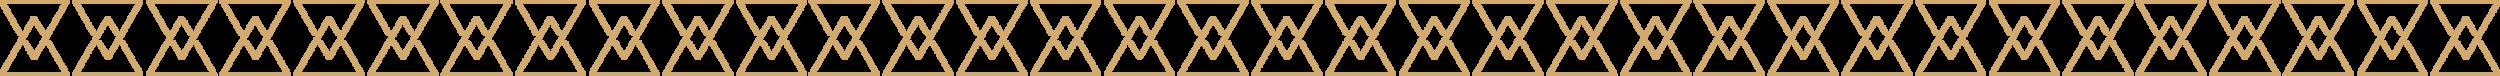 Tribal Shaman-Design-Kit-46.png